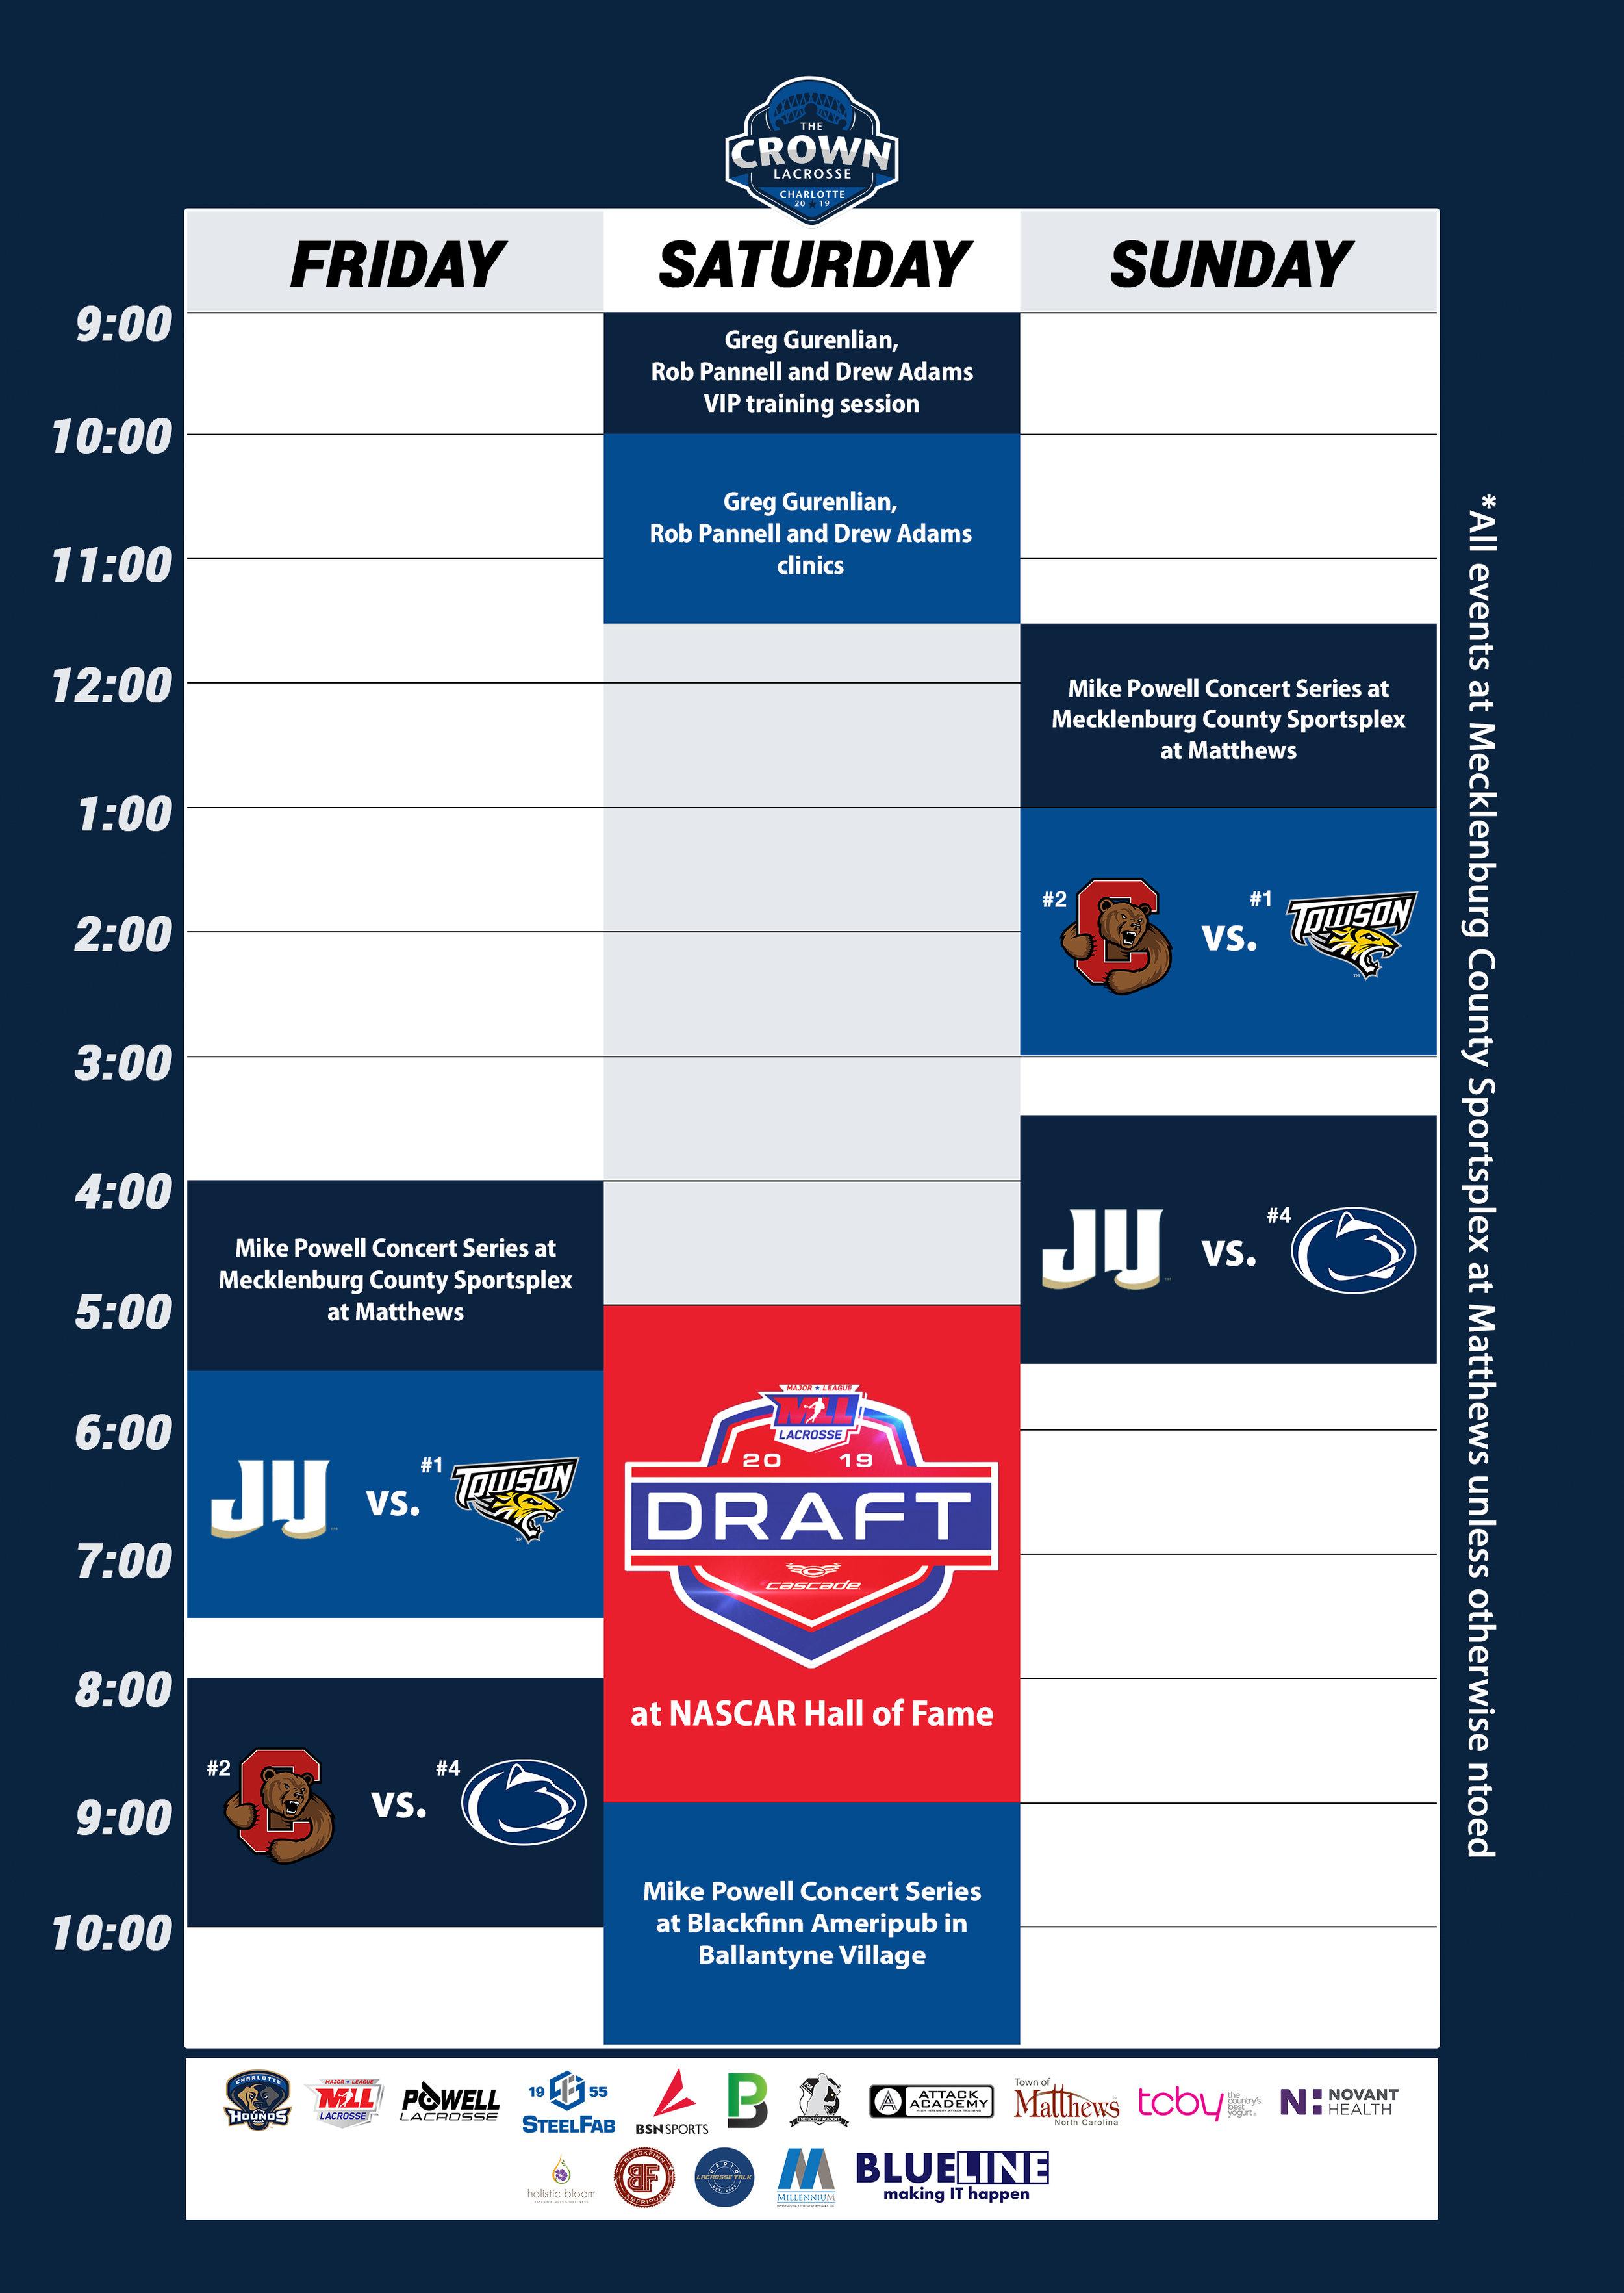 crown schedule.jpg